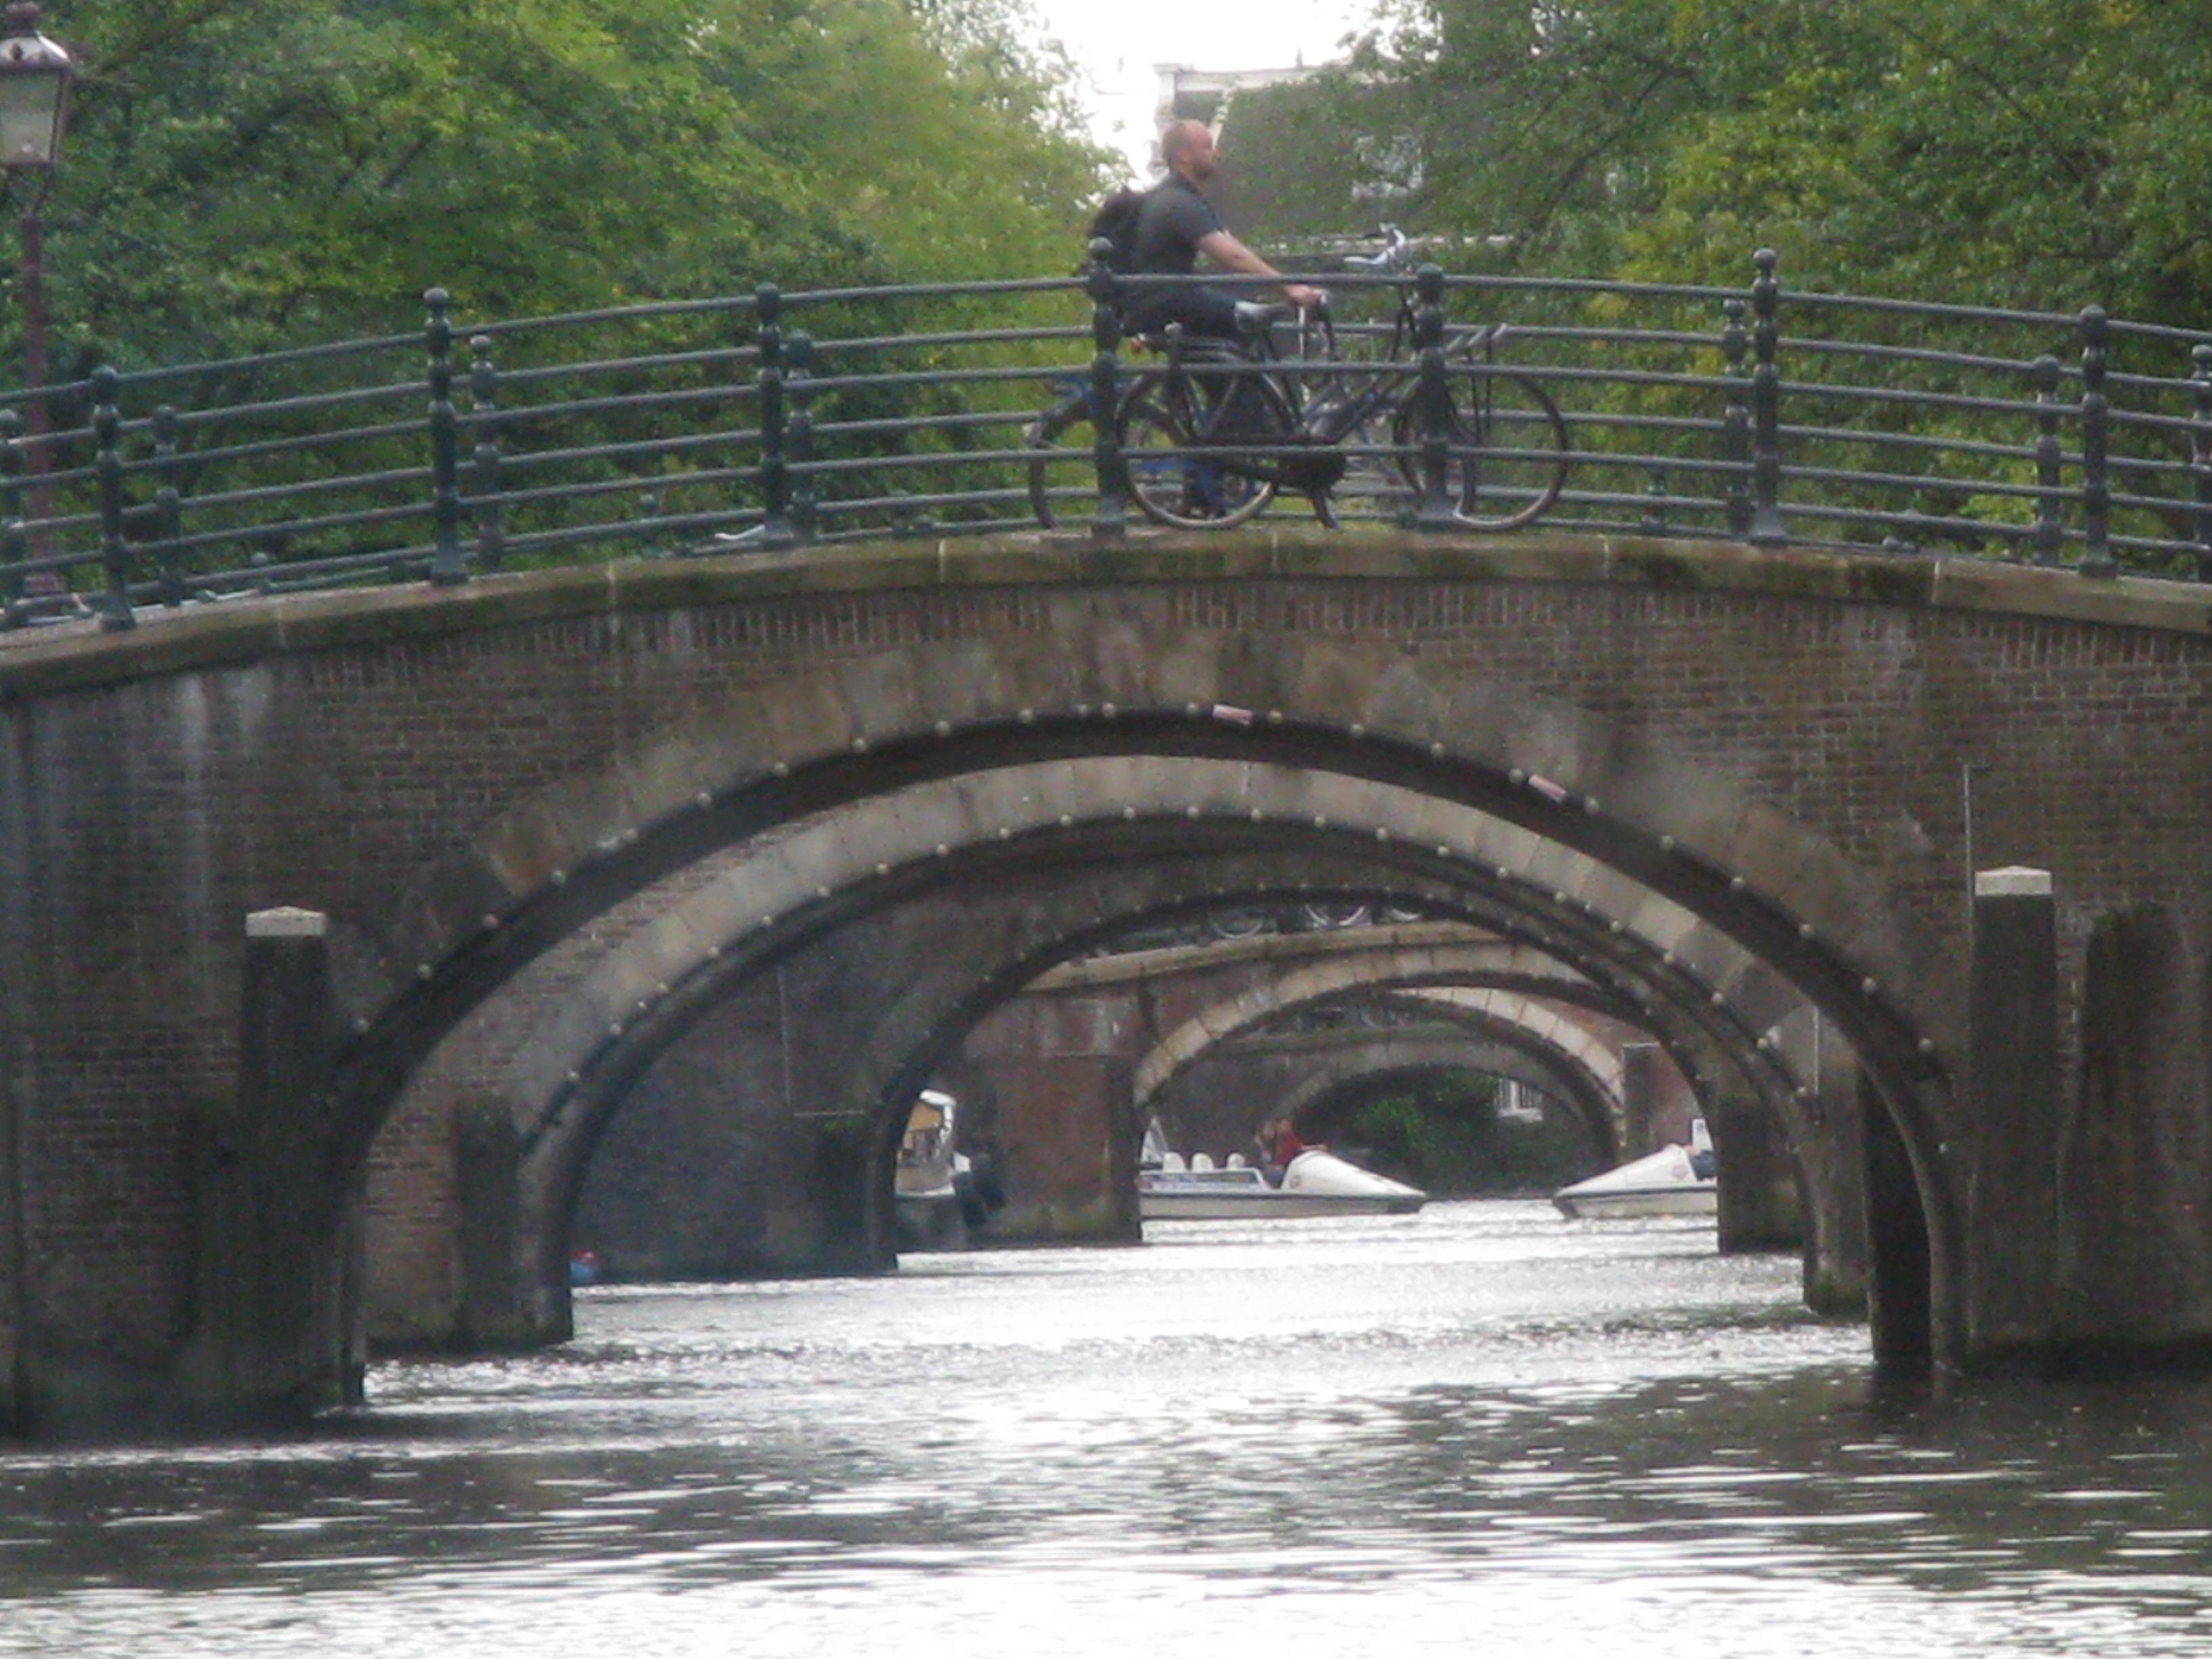 File:Bridges over Canal- Amsterdam.jpg